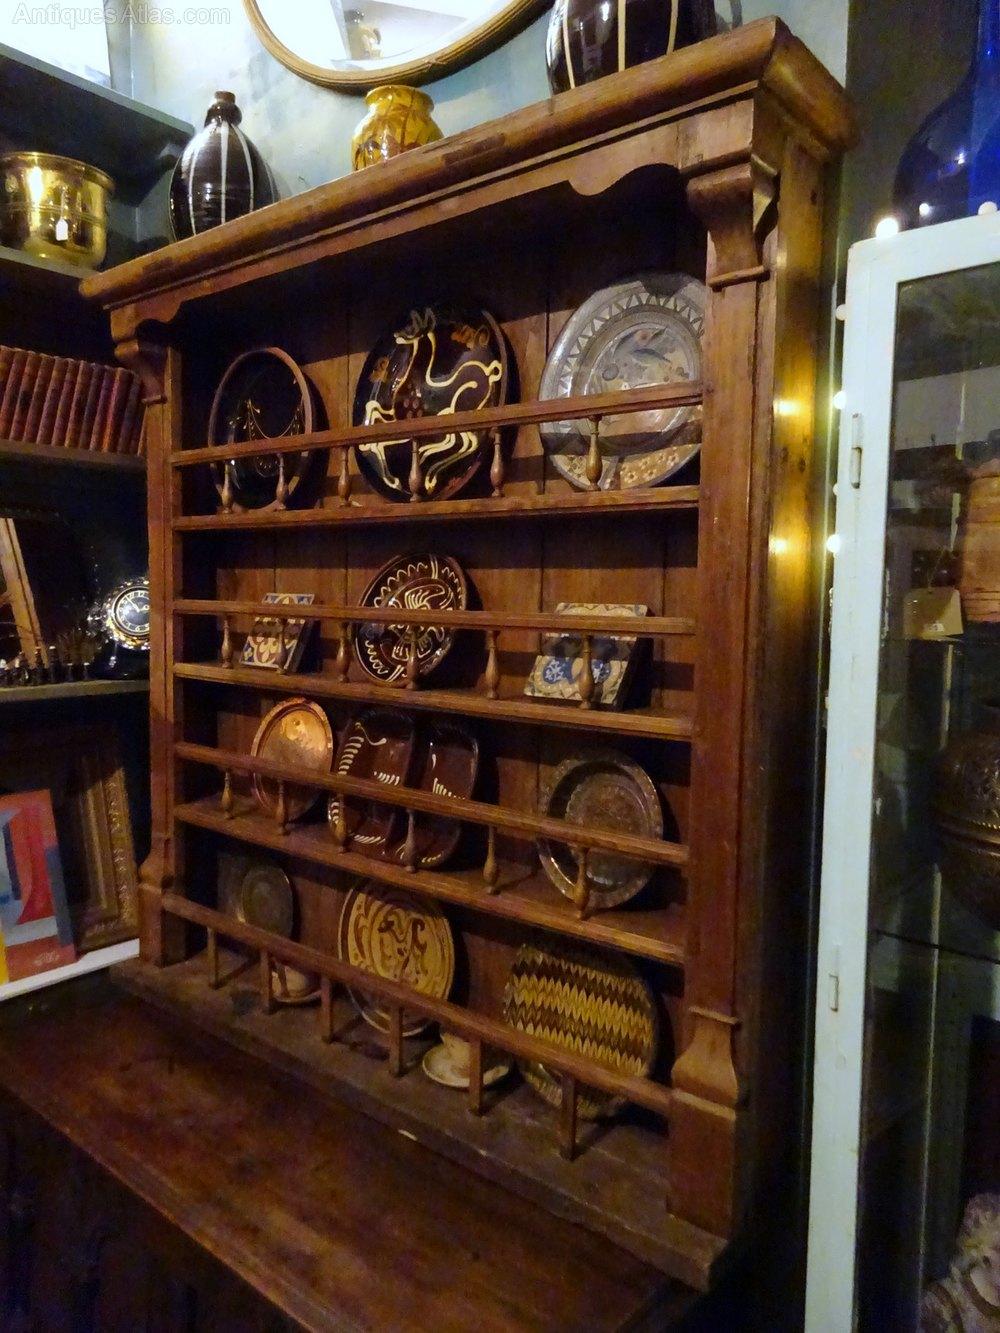 Victorian Pine Dresser Top - Plate Rack Antique Dresser Tops Country Kitchen Dresser ... & Victorian Pine Dresser Top - Plate Rack - Antiques Atlas